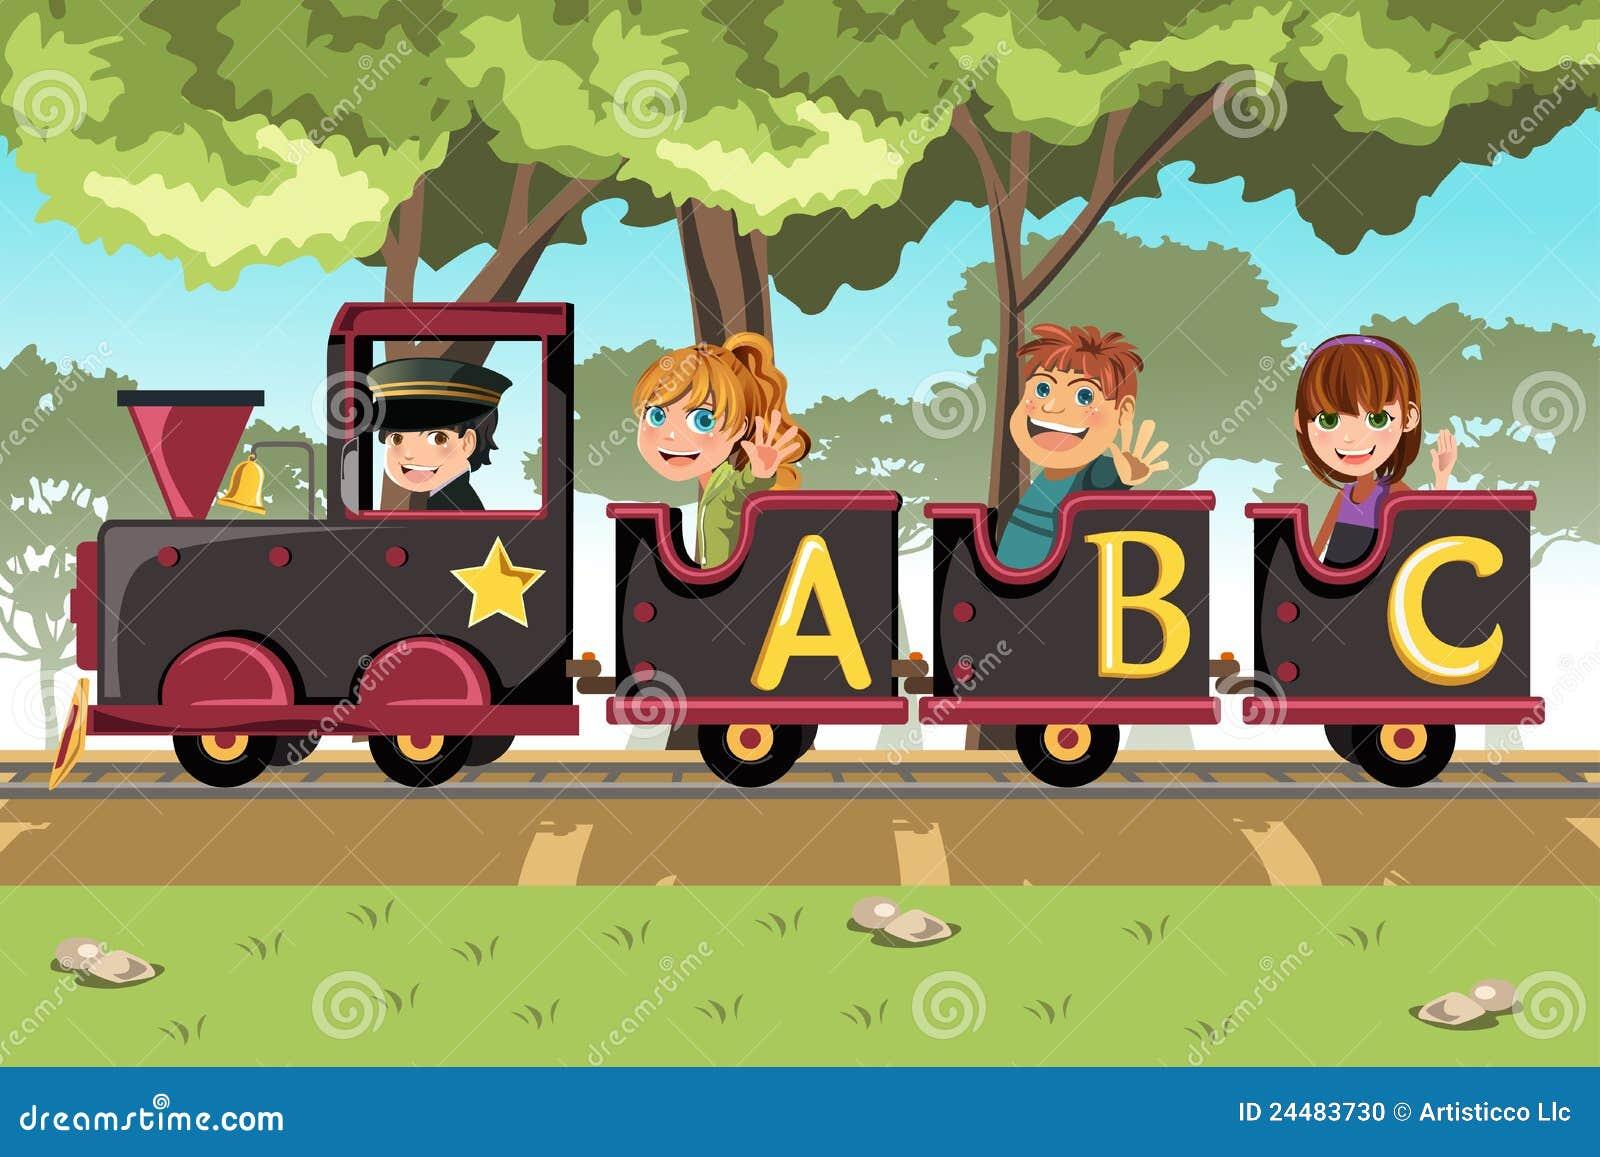 Alphabet train coloring - Kids Riding Alphabet Train Stock Photo